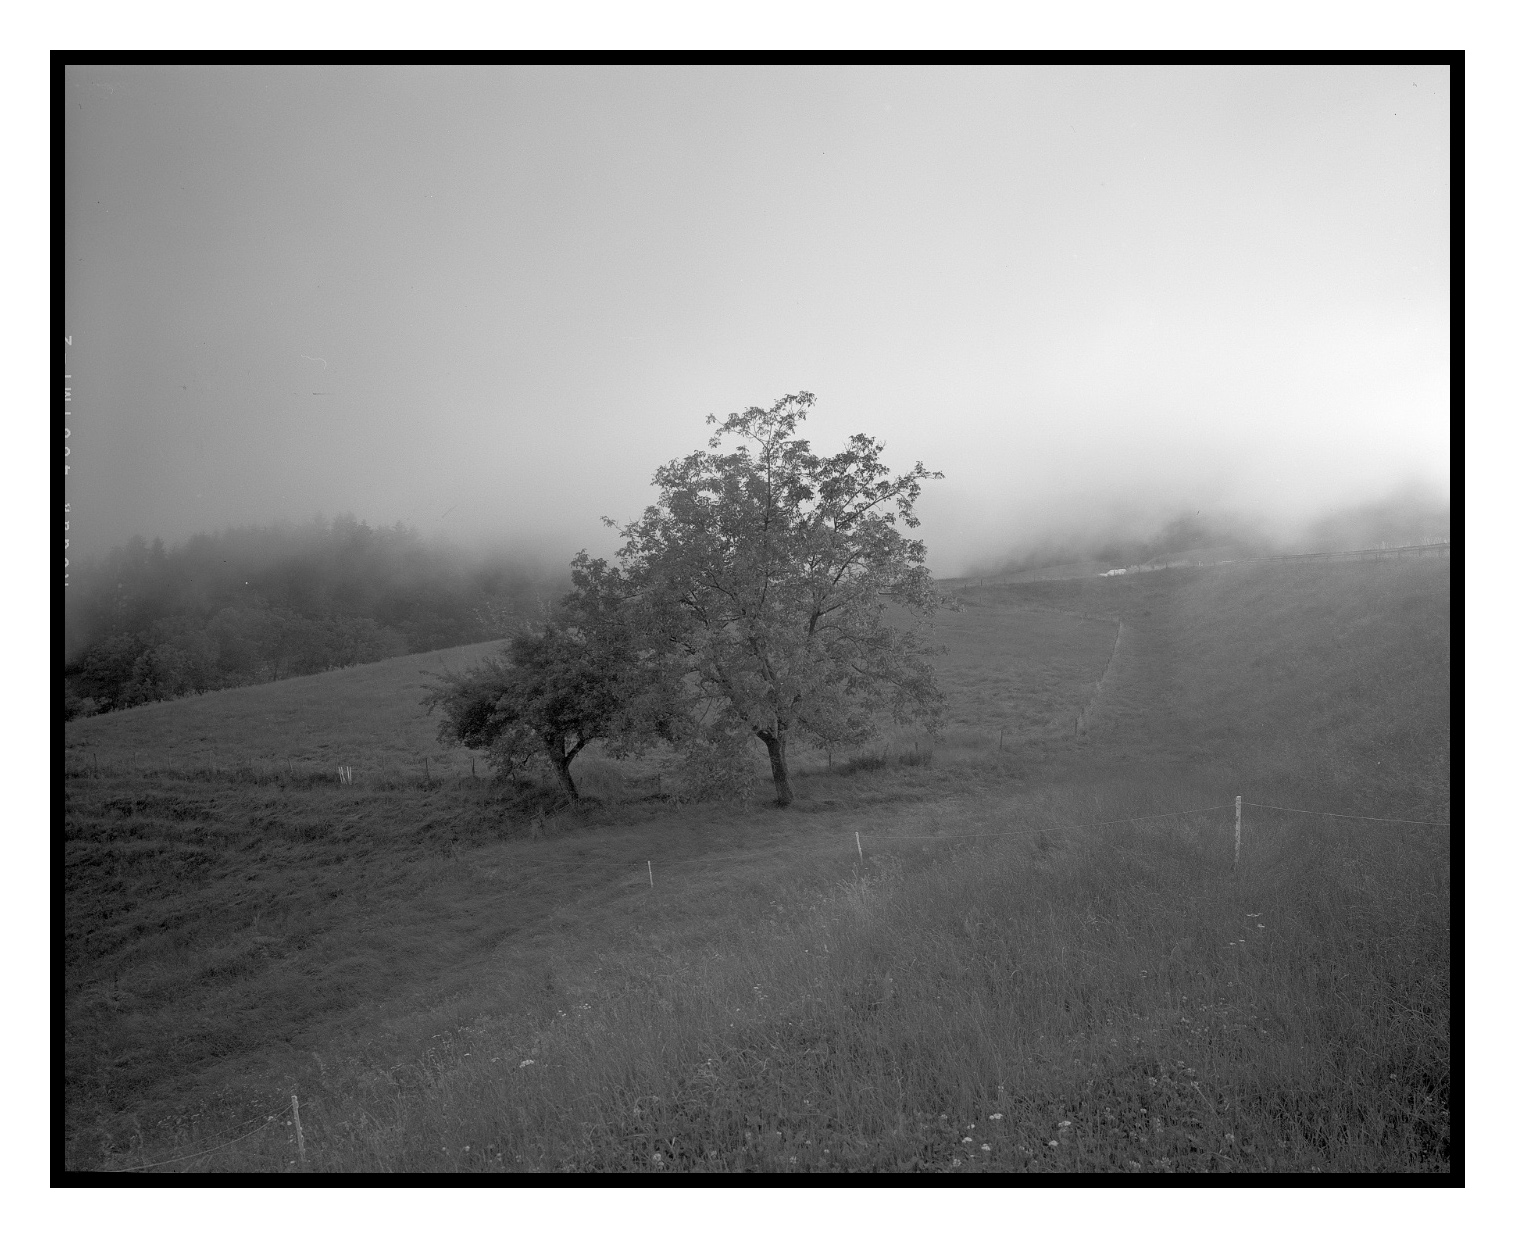 film-481.1-1500px-II-frame